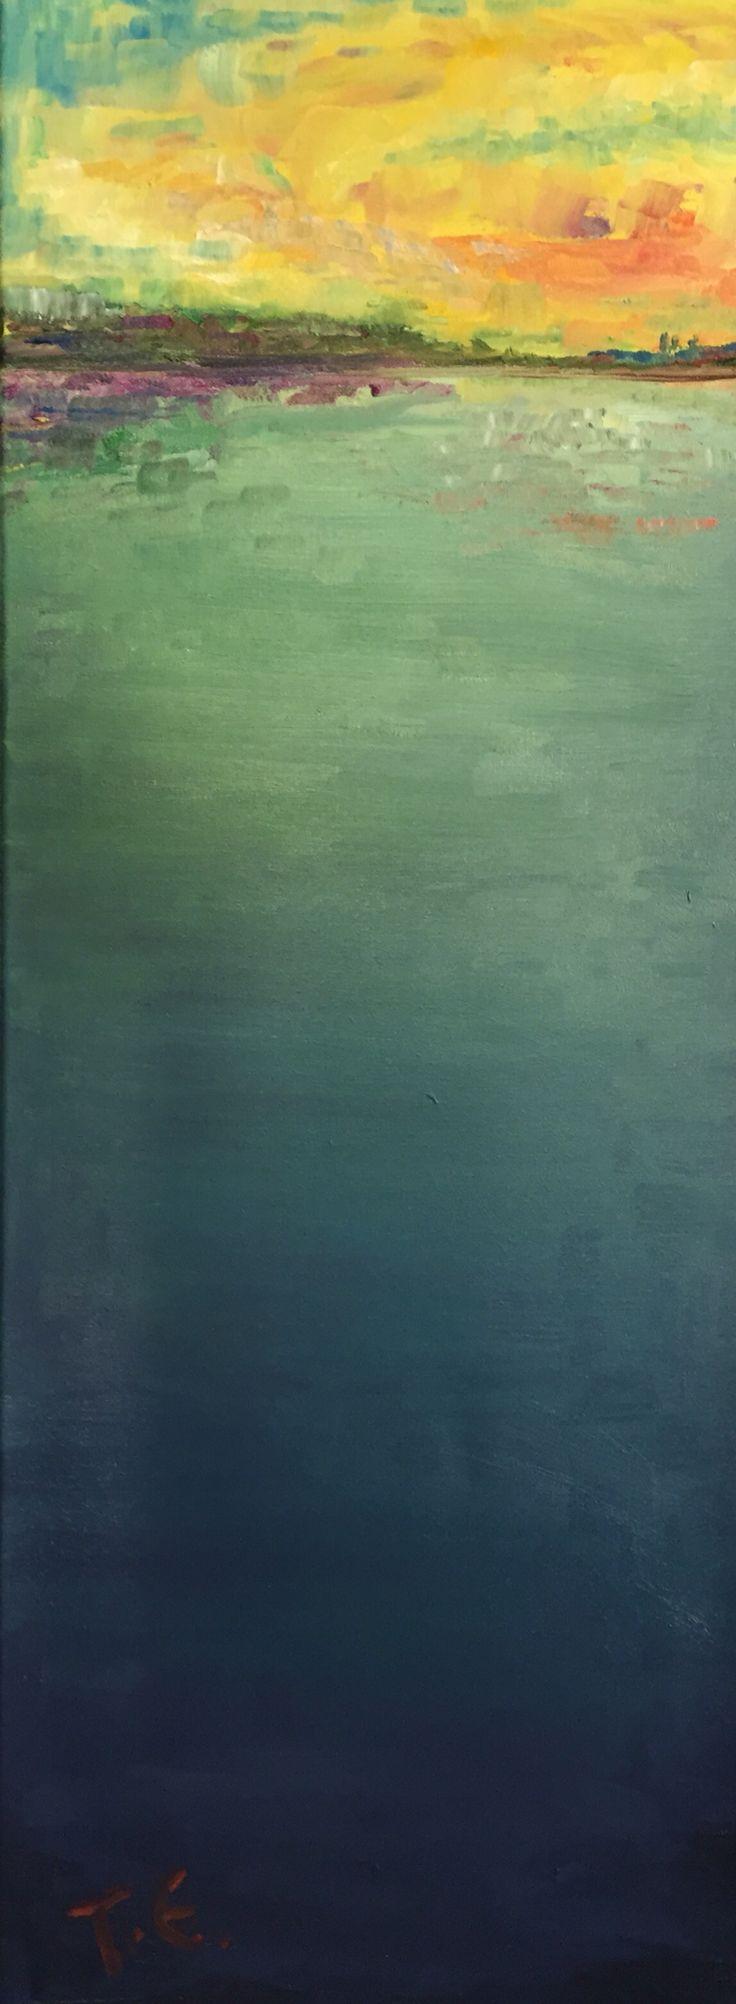 "Grazy About Sun Set (""Hulluna auringonlaskuun""), Oil Painting 2016/04"